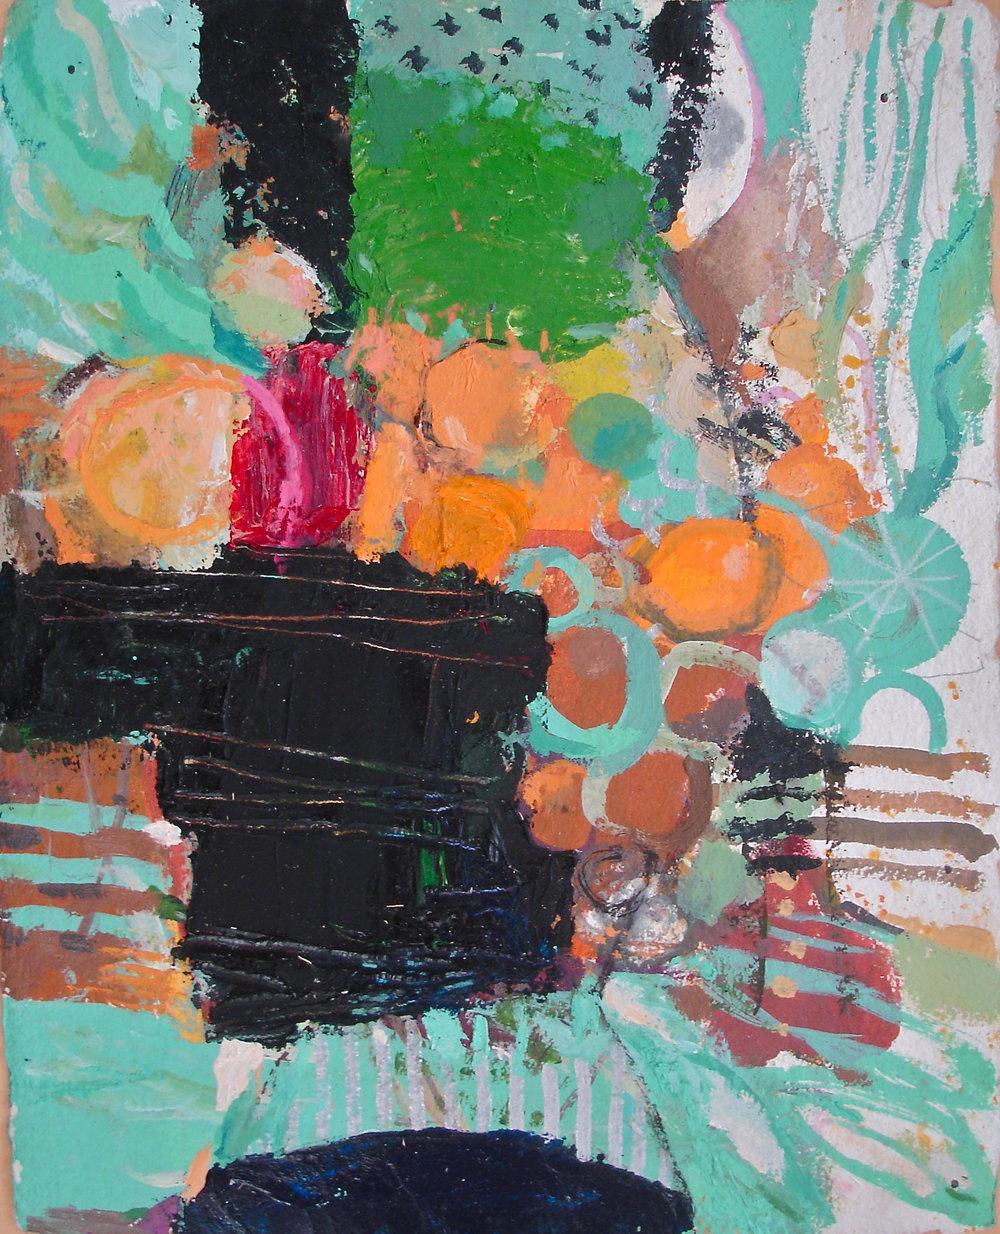 Carafe, 12 x 14, vinyl color on paper